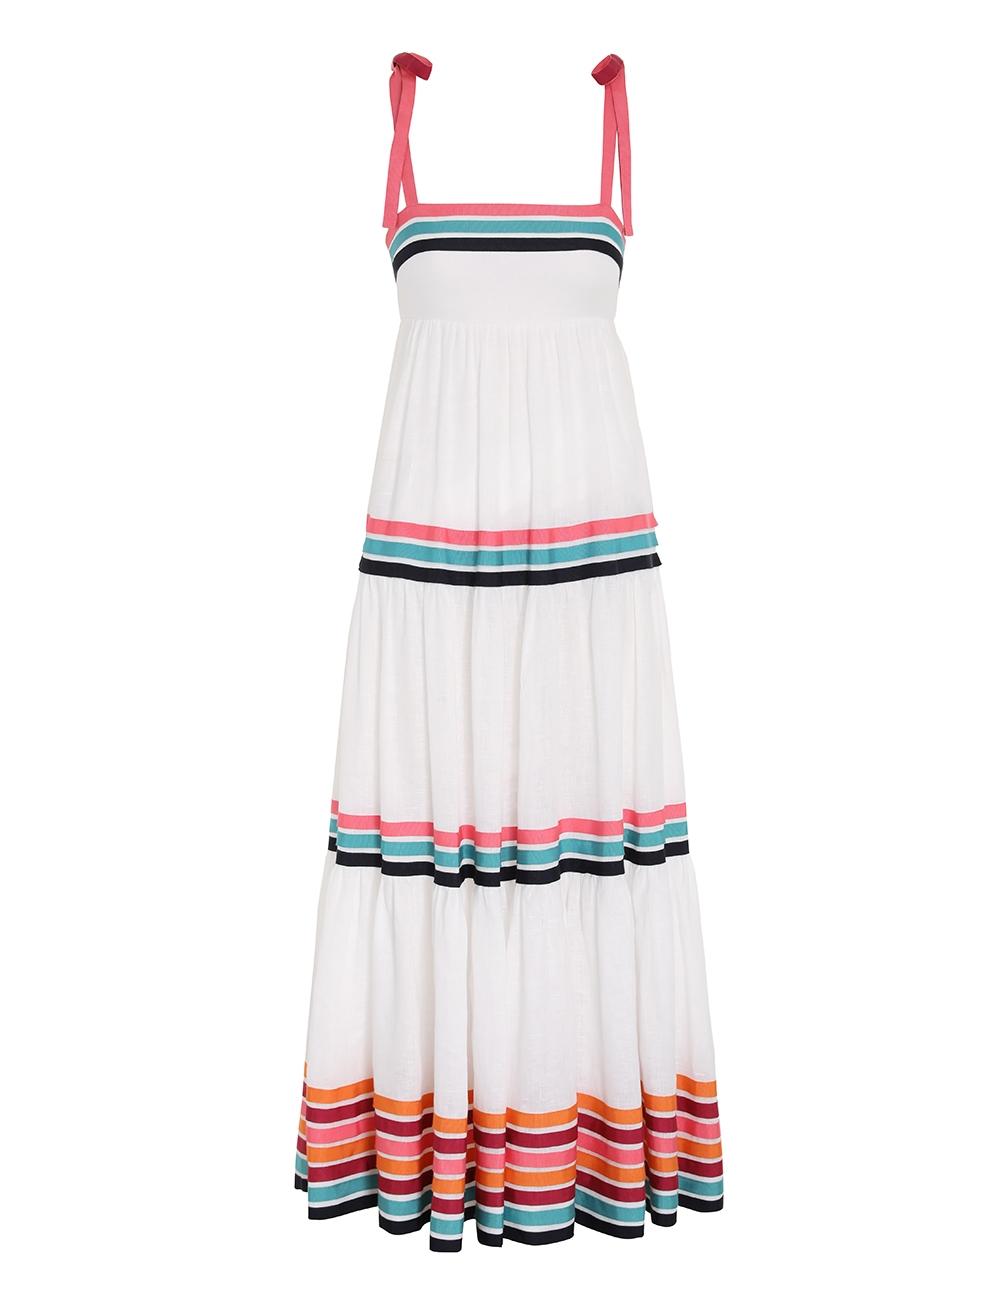 Lulu Ribbon Tiered Dress